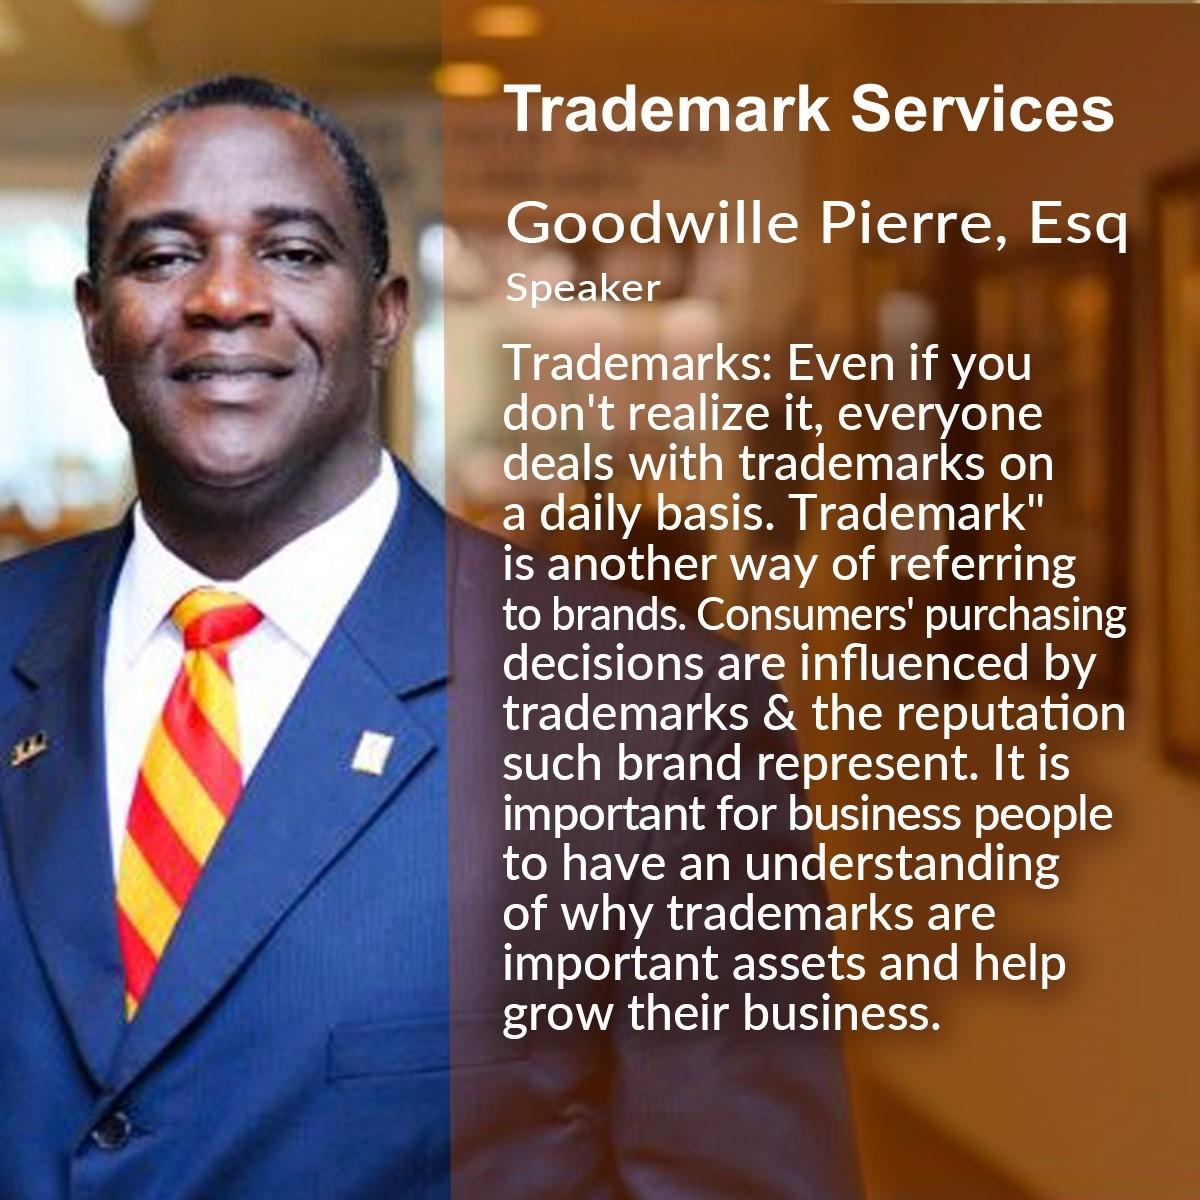 Trademark Services Installments